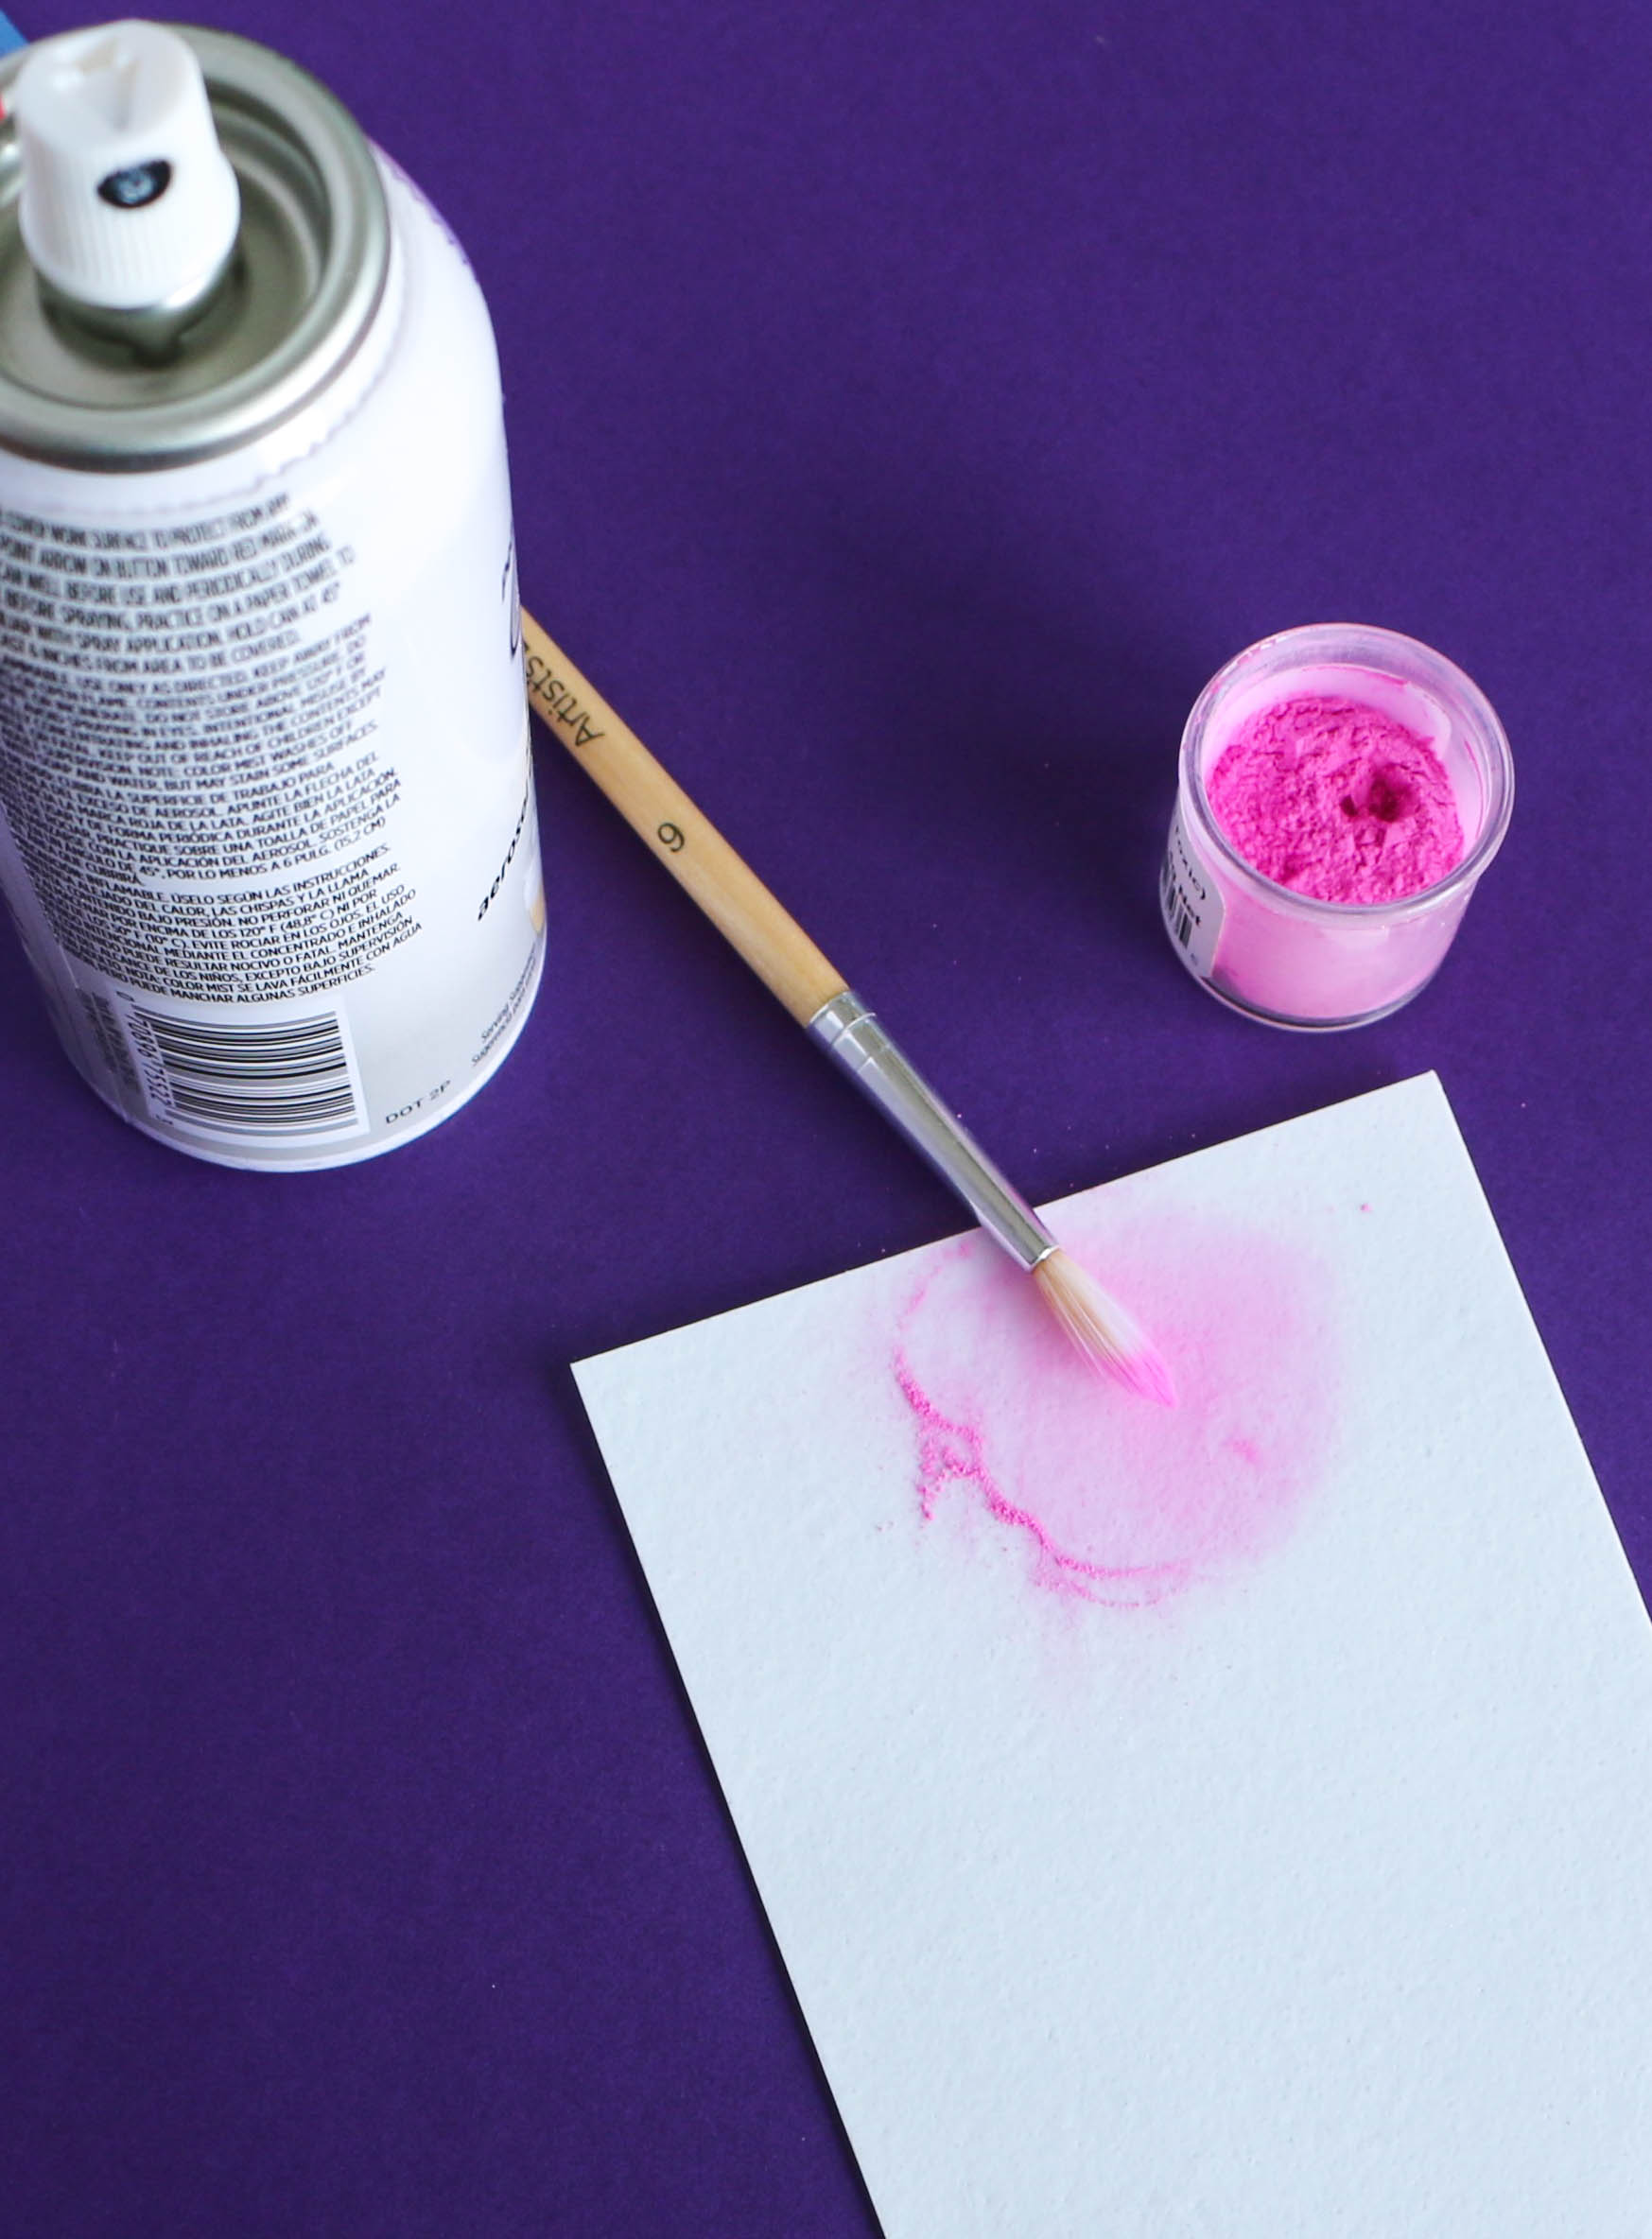 Coloring Icing Sheets | Erin Gardner | Bluprint